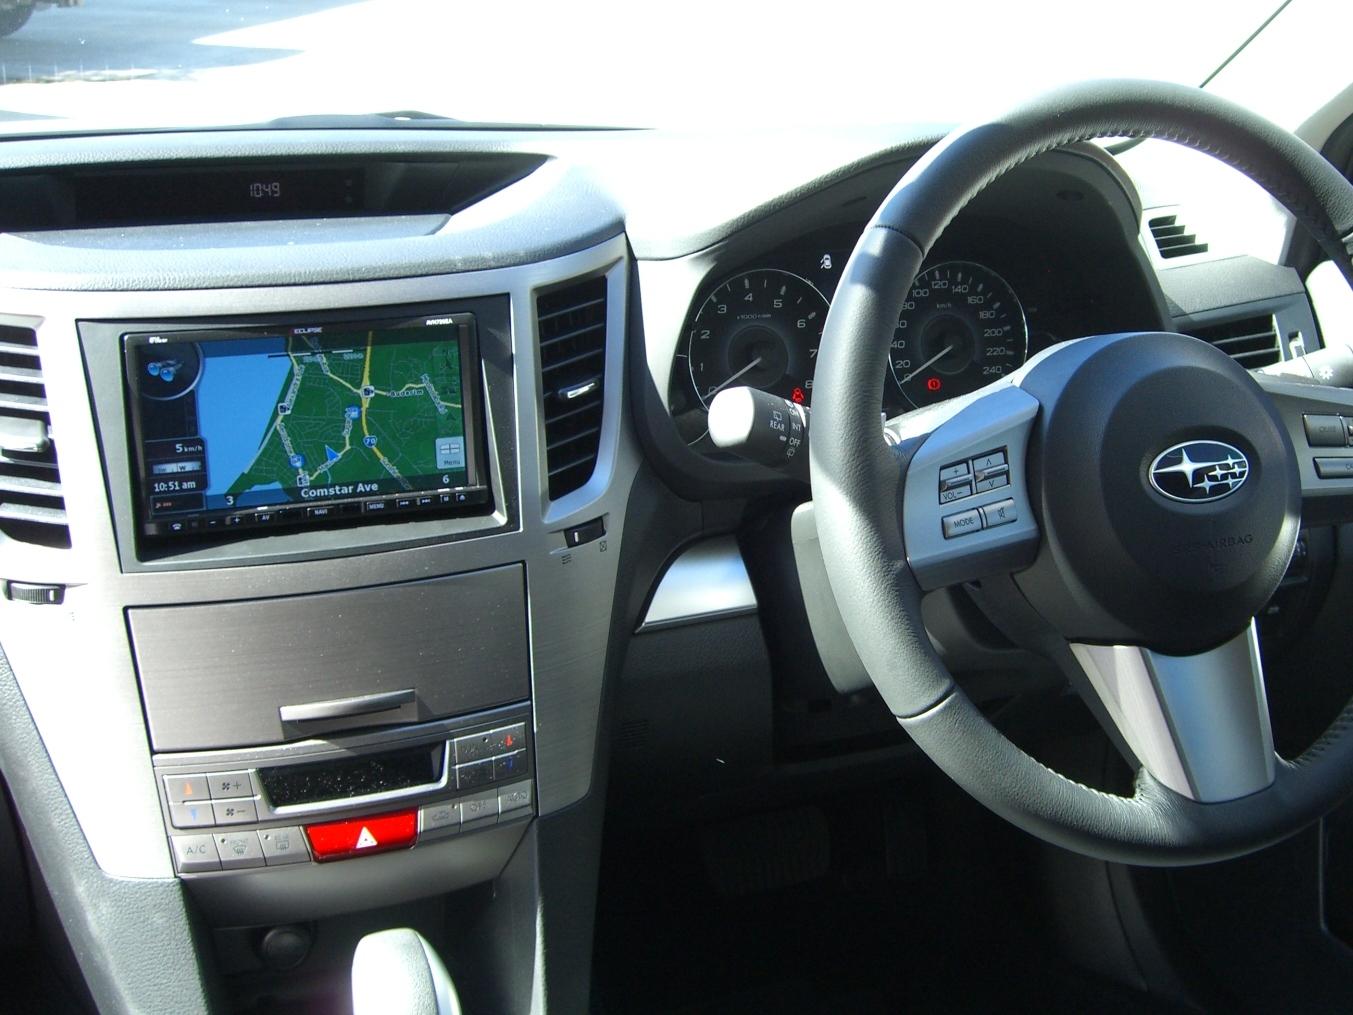 Subaru Outback 2010 Eclipse Gps Navigation Reverse Camera